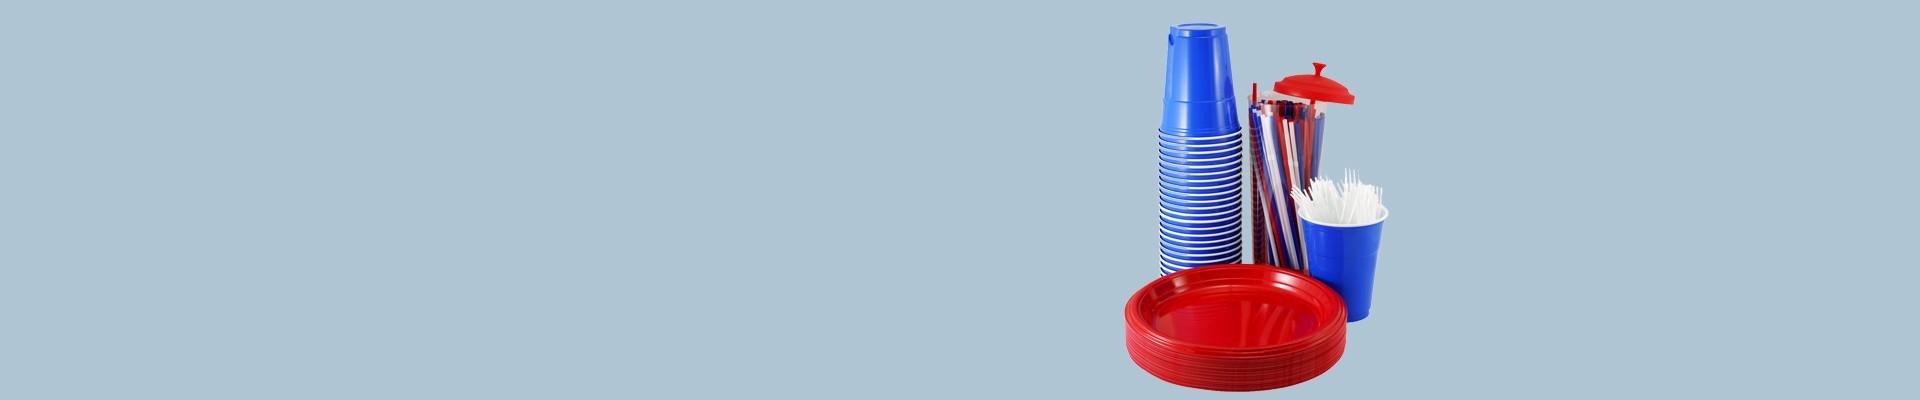 Jual Piring Kertas & Gelas Kertas (Paper Cup) Harga Grosir